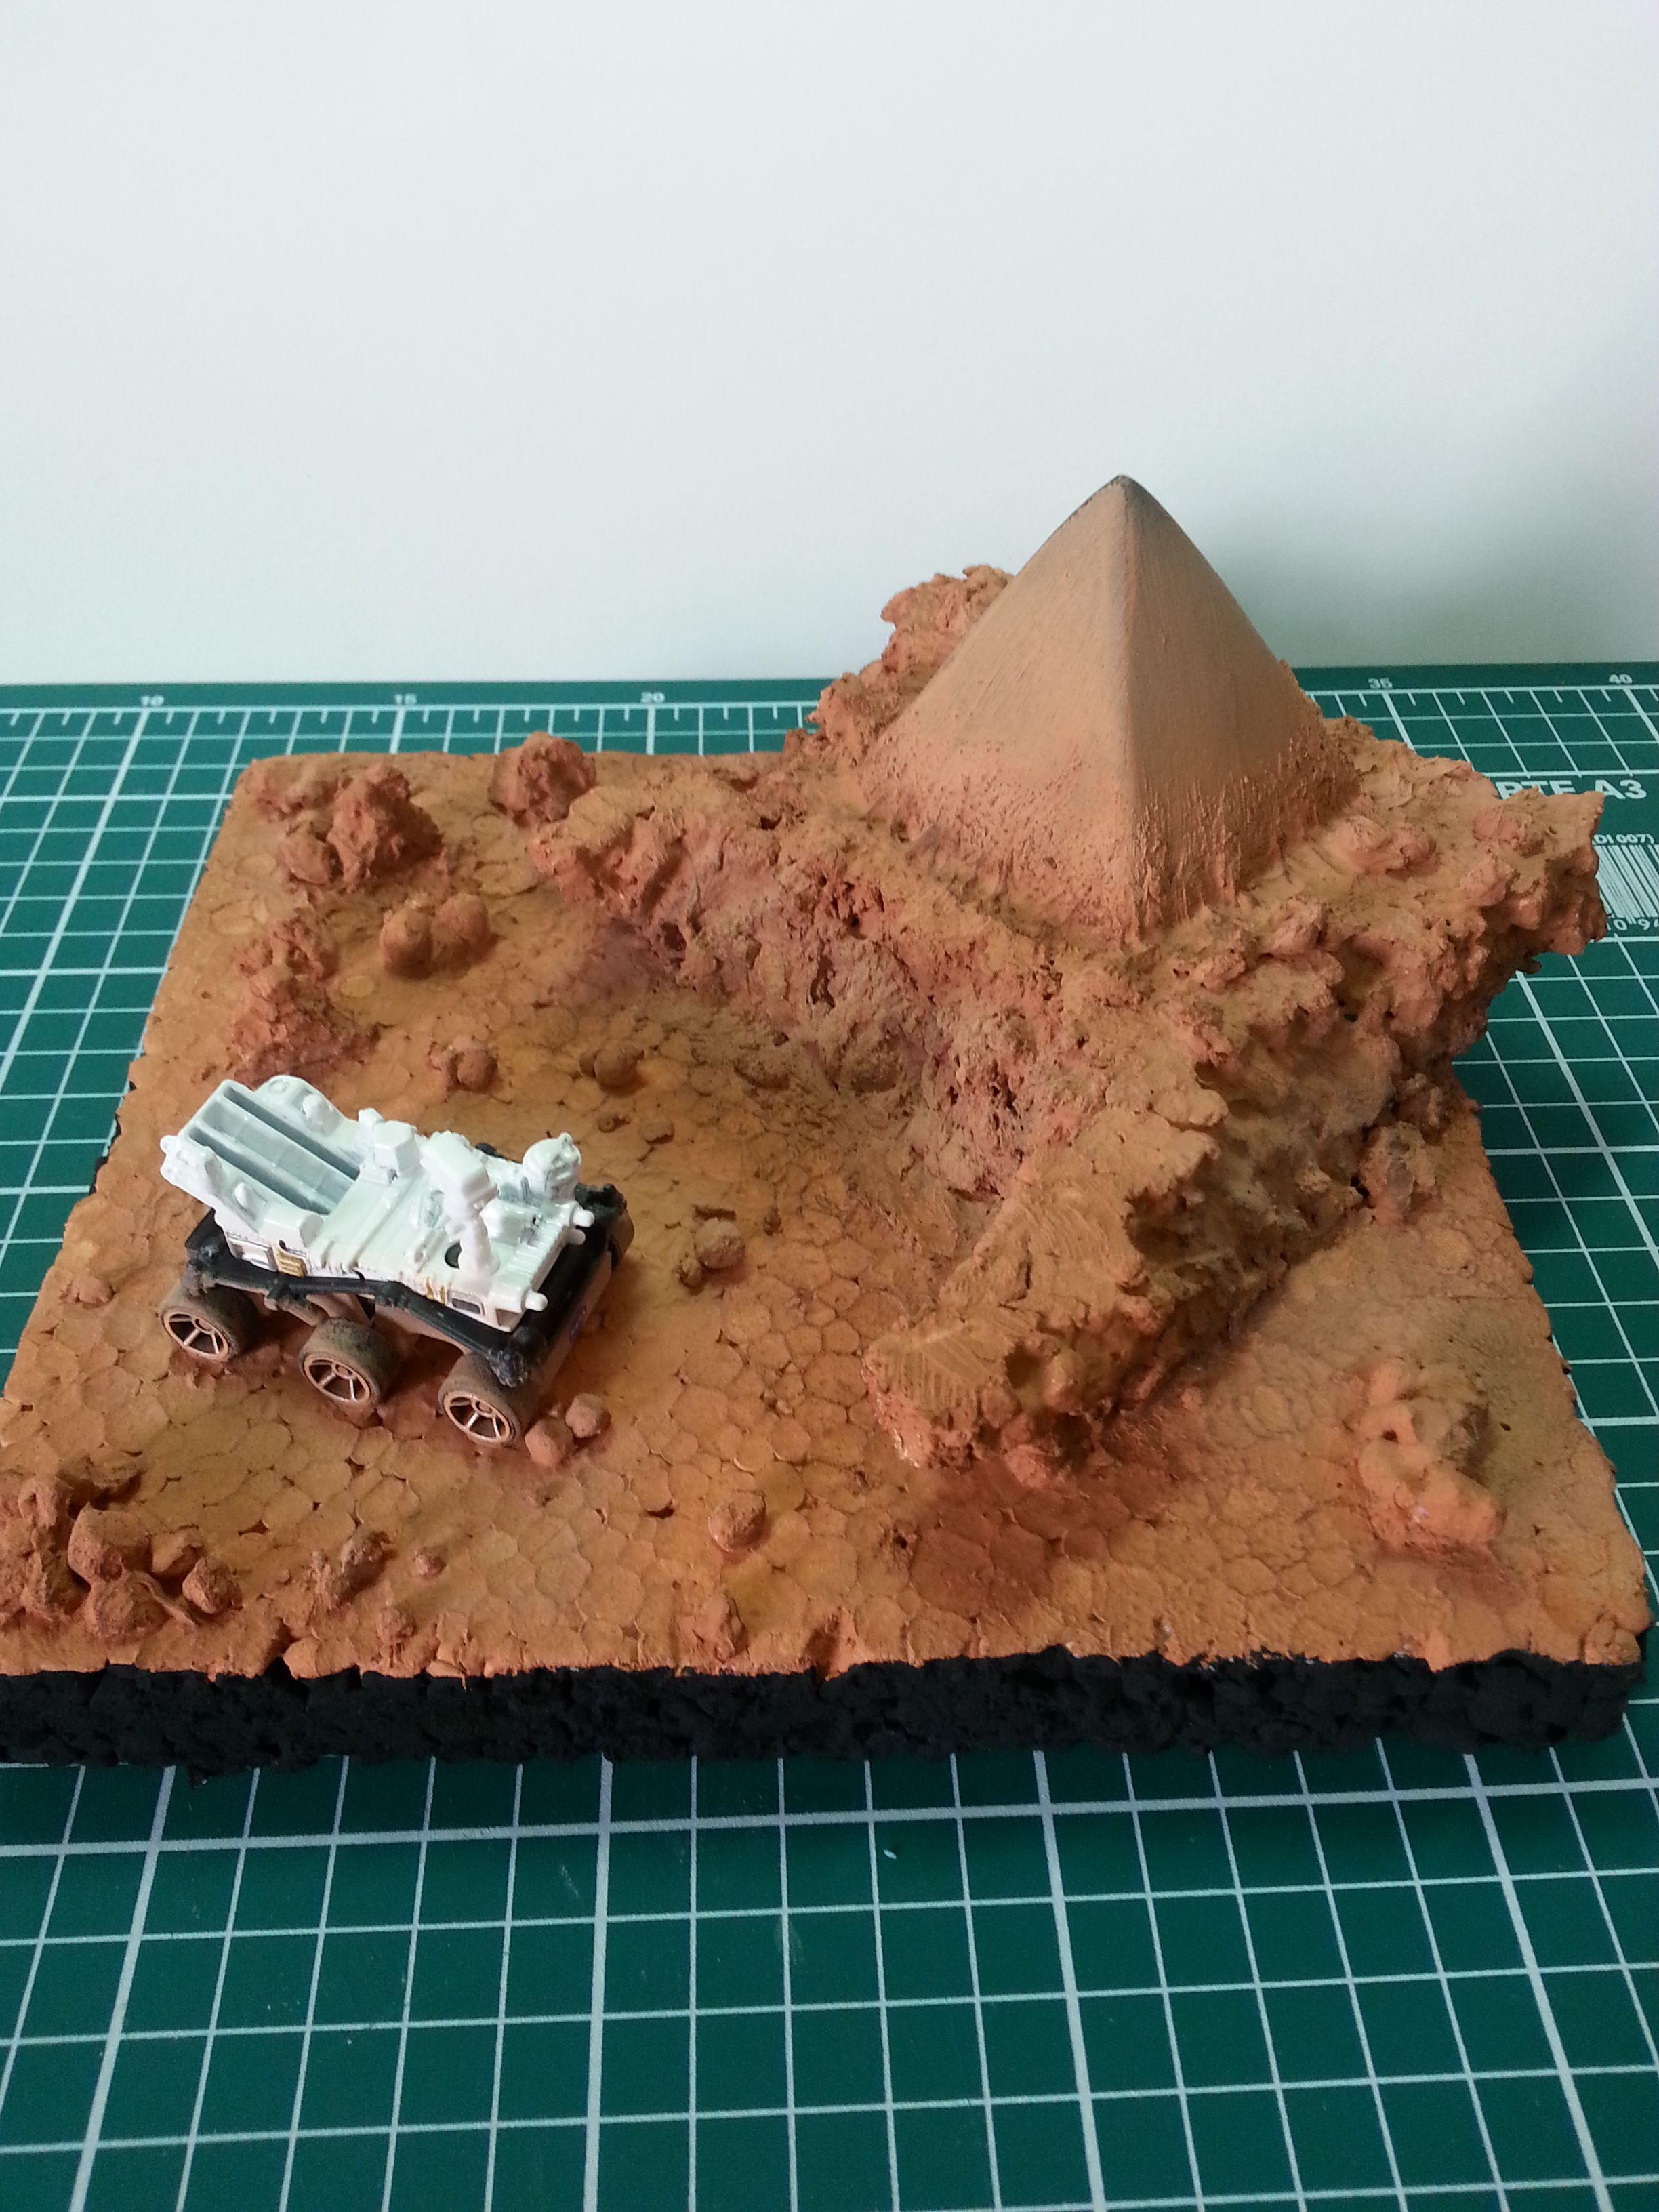 how to make a planet diorama